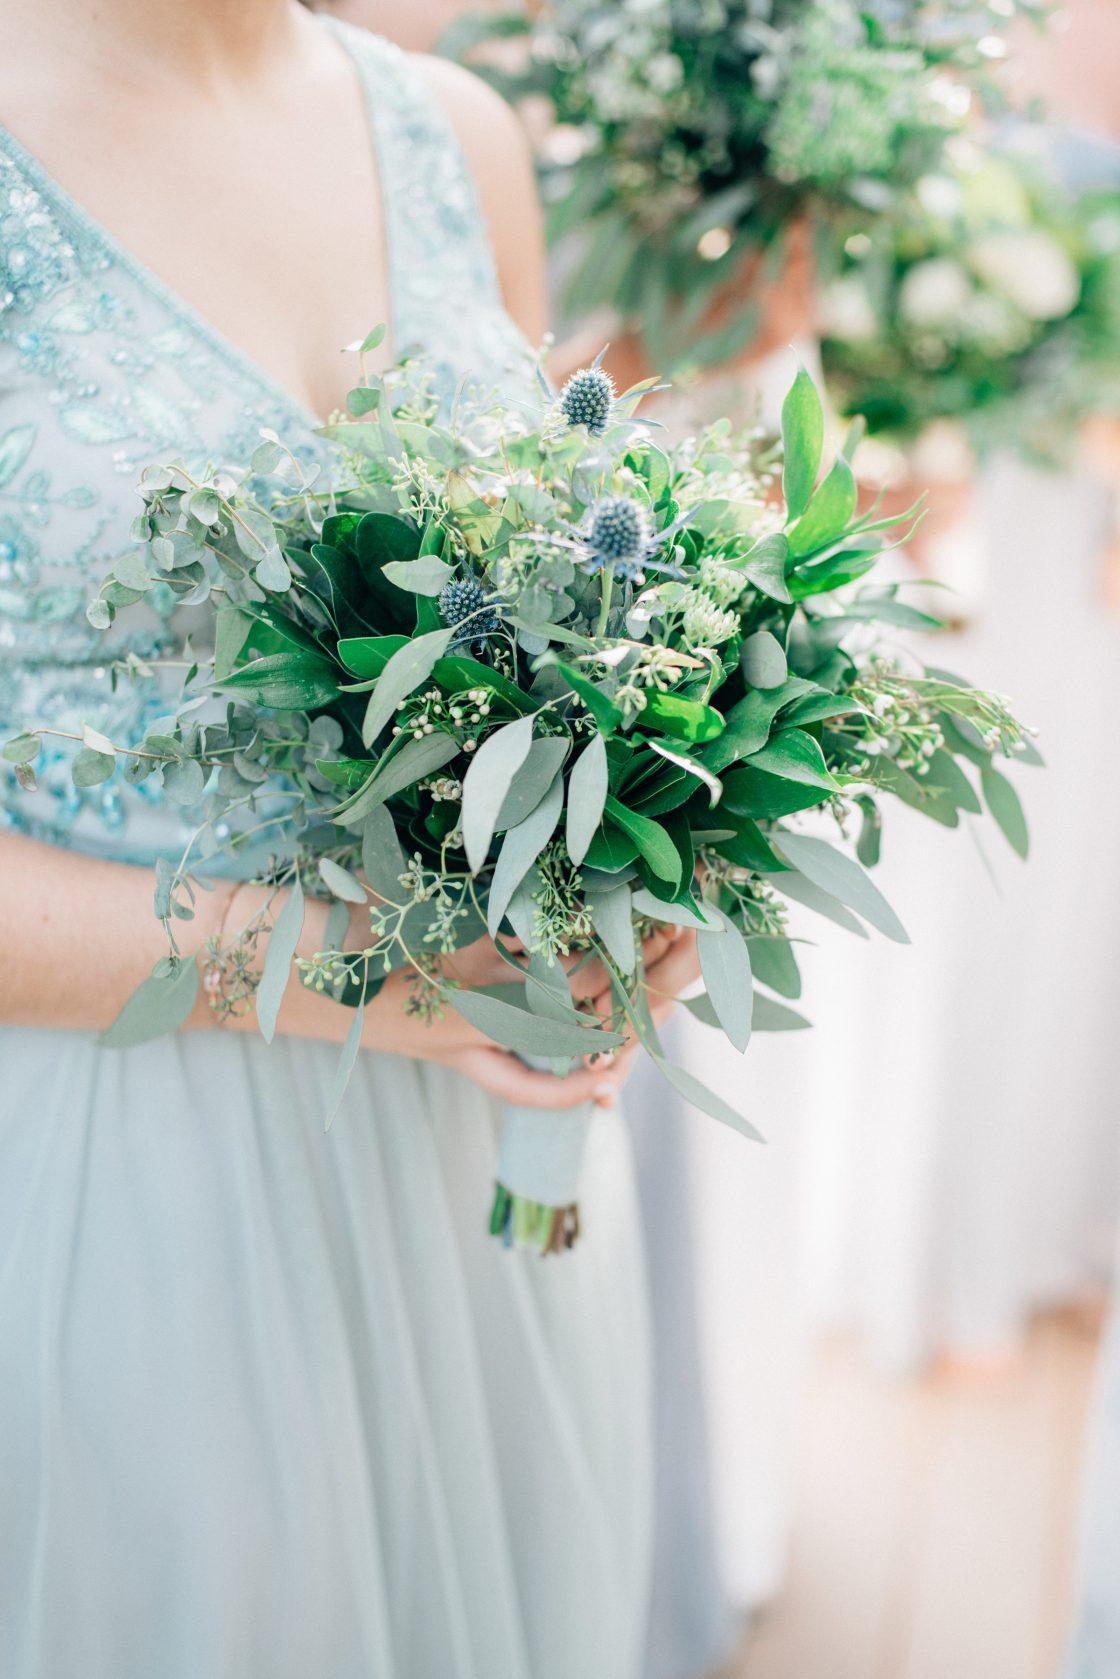 Elegant New Jersey Wedding with Greenery 5